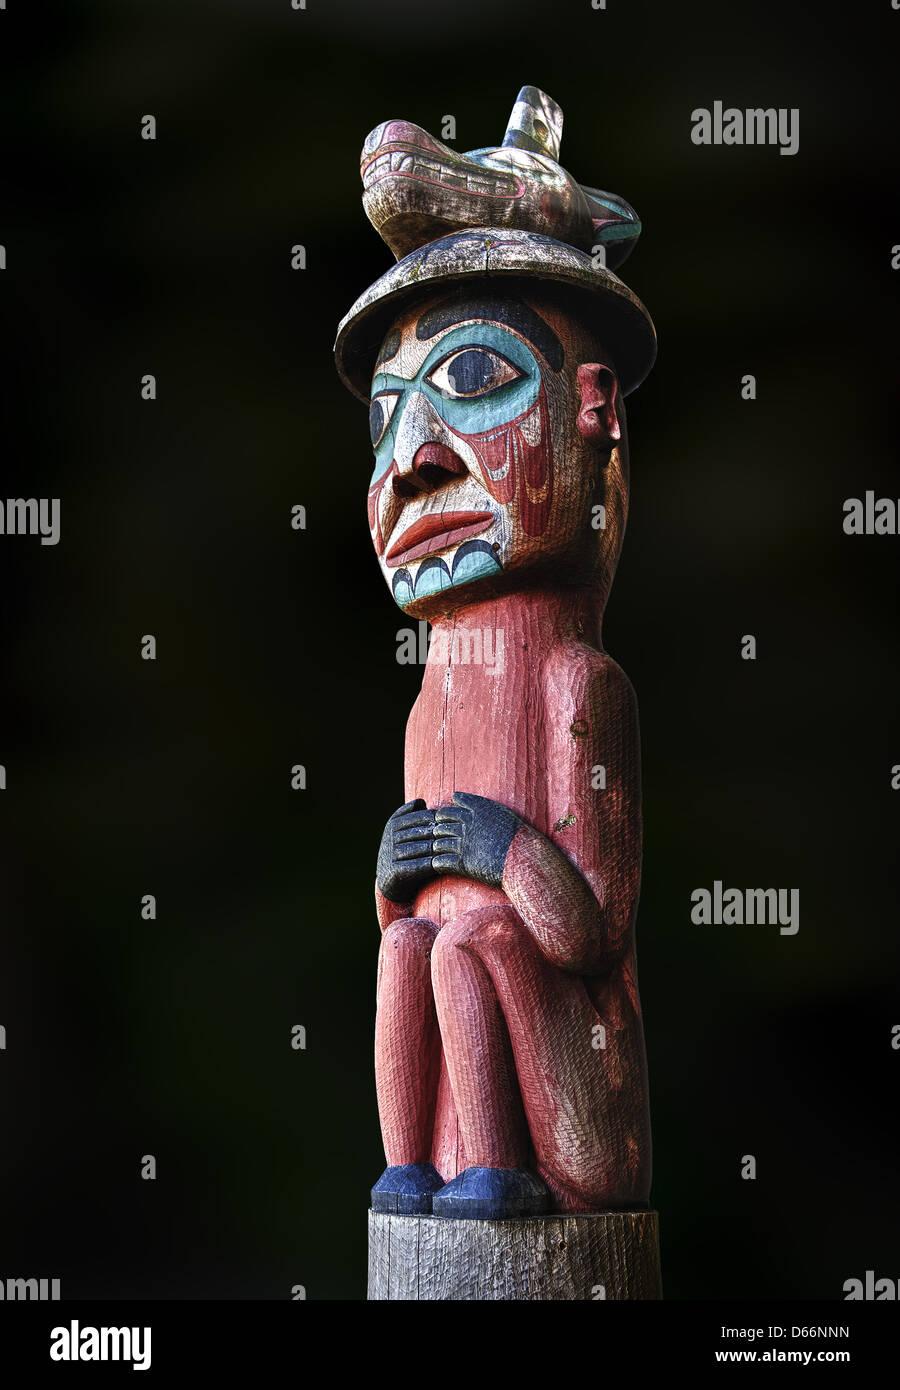 The Tongass Watchman totem - Stock Image